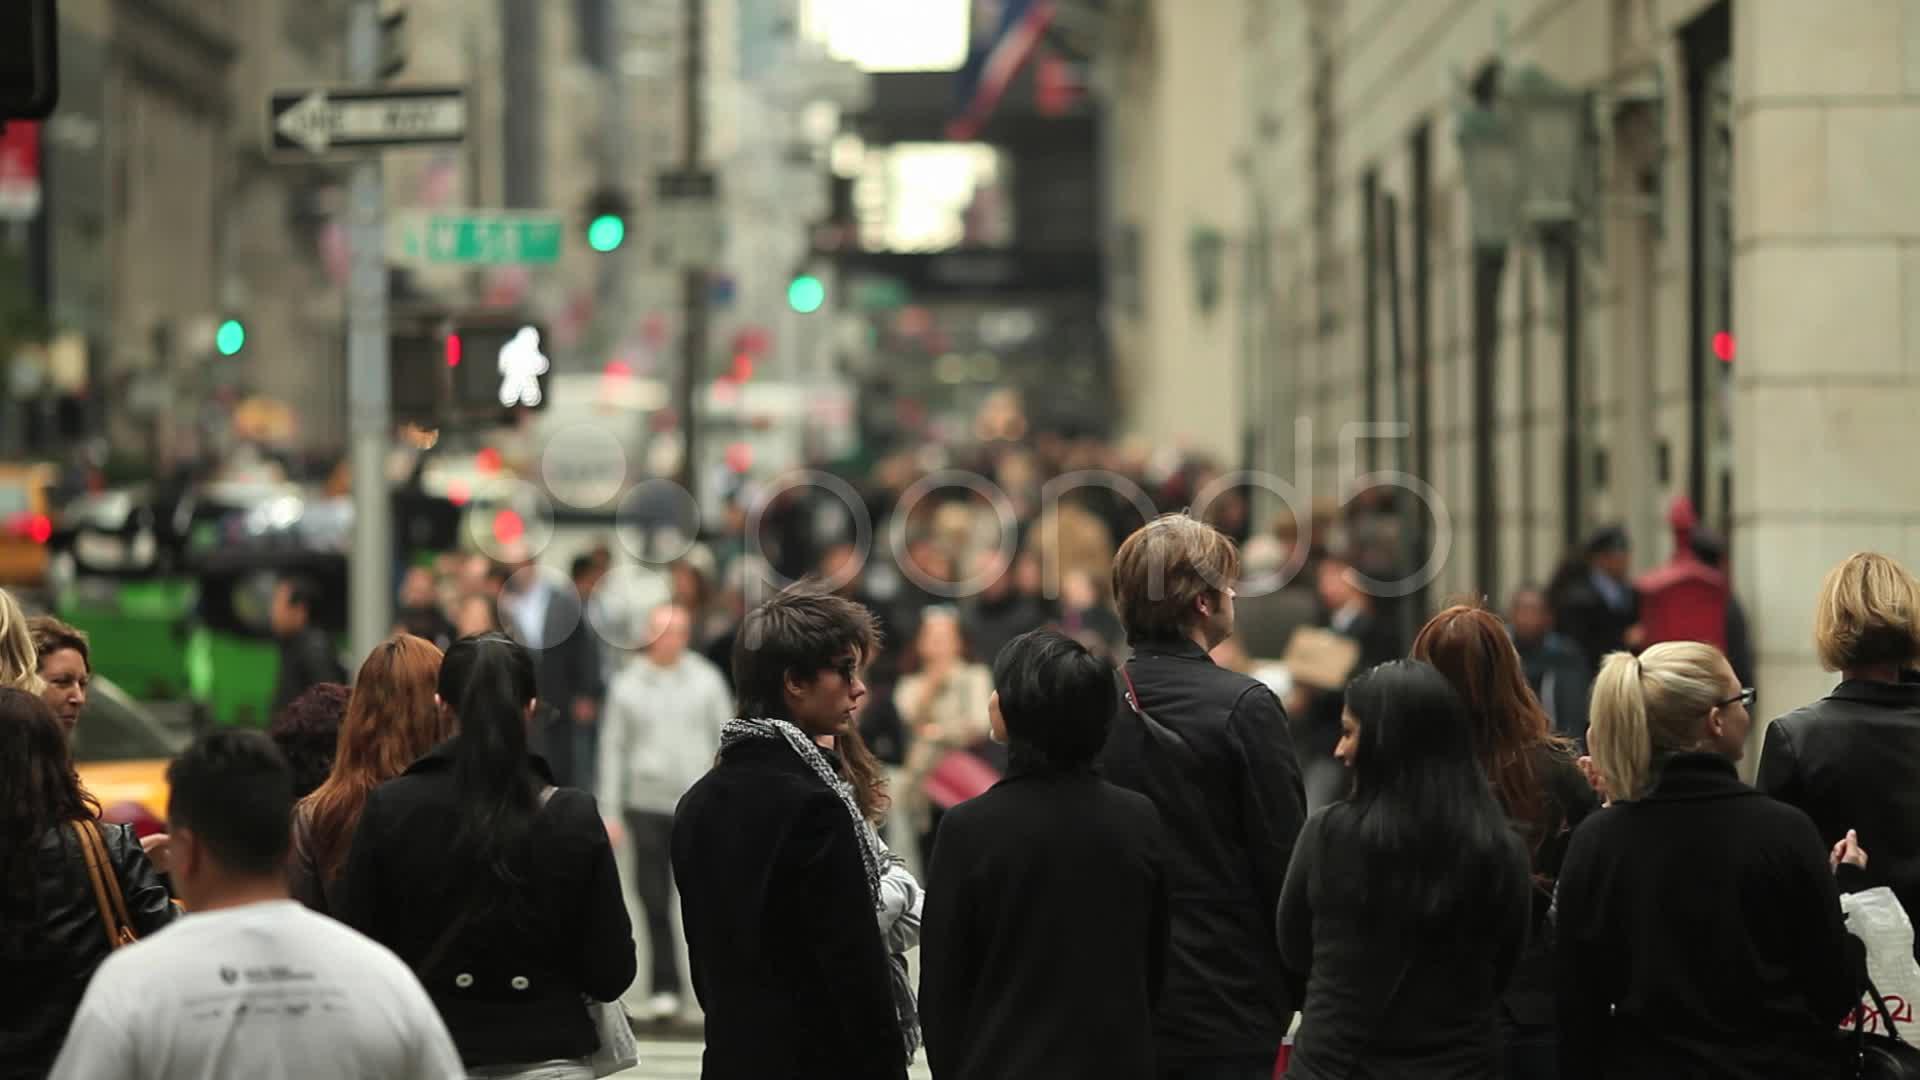 Crowd of People Walking in New York City